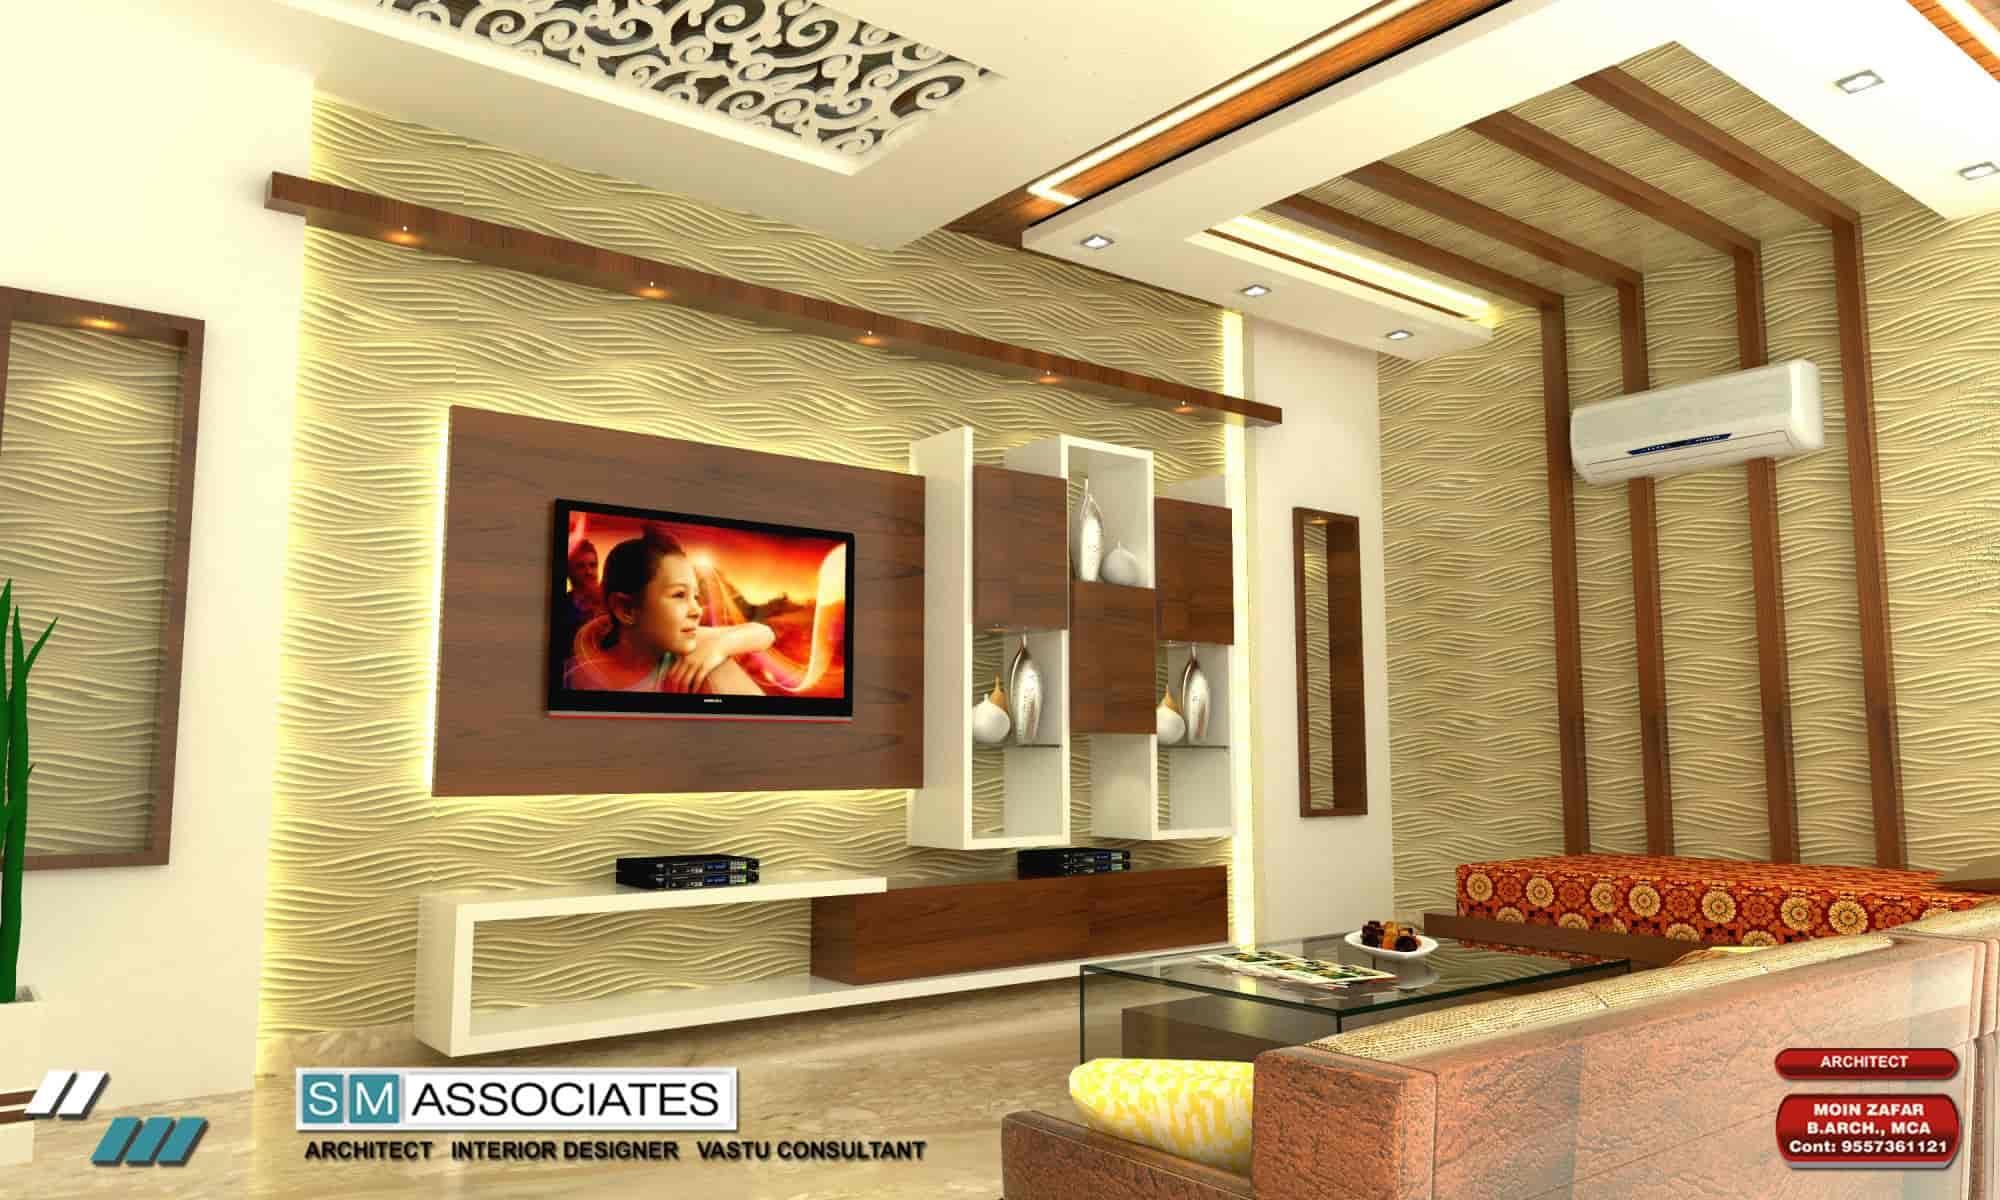 S M Architect Interior Designer Meerut City Architects In Meerut Justdial